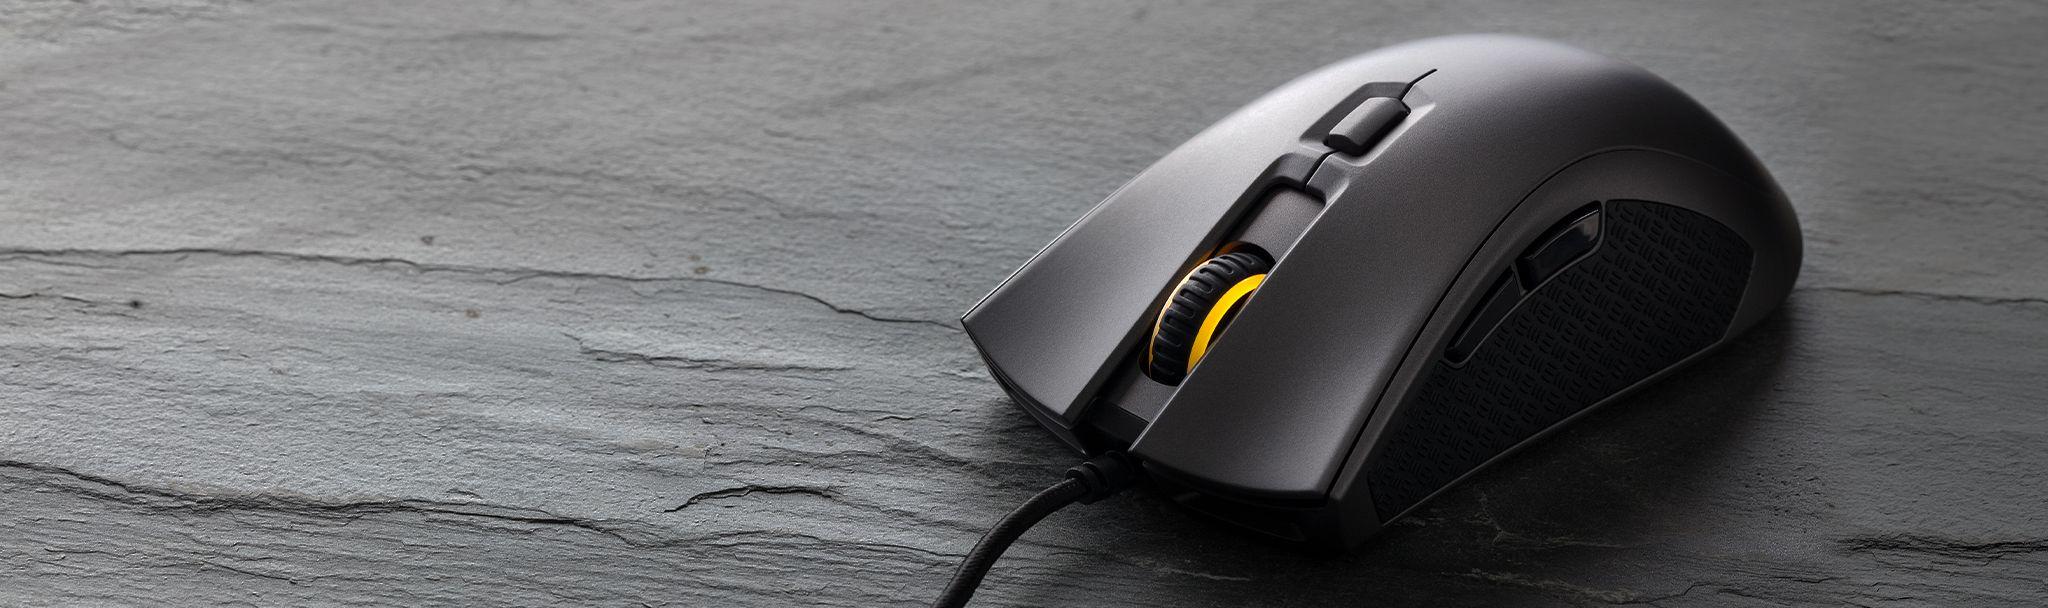 hx-keyfeatures-mice-pulsefire-fps-pro-3-lg